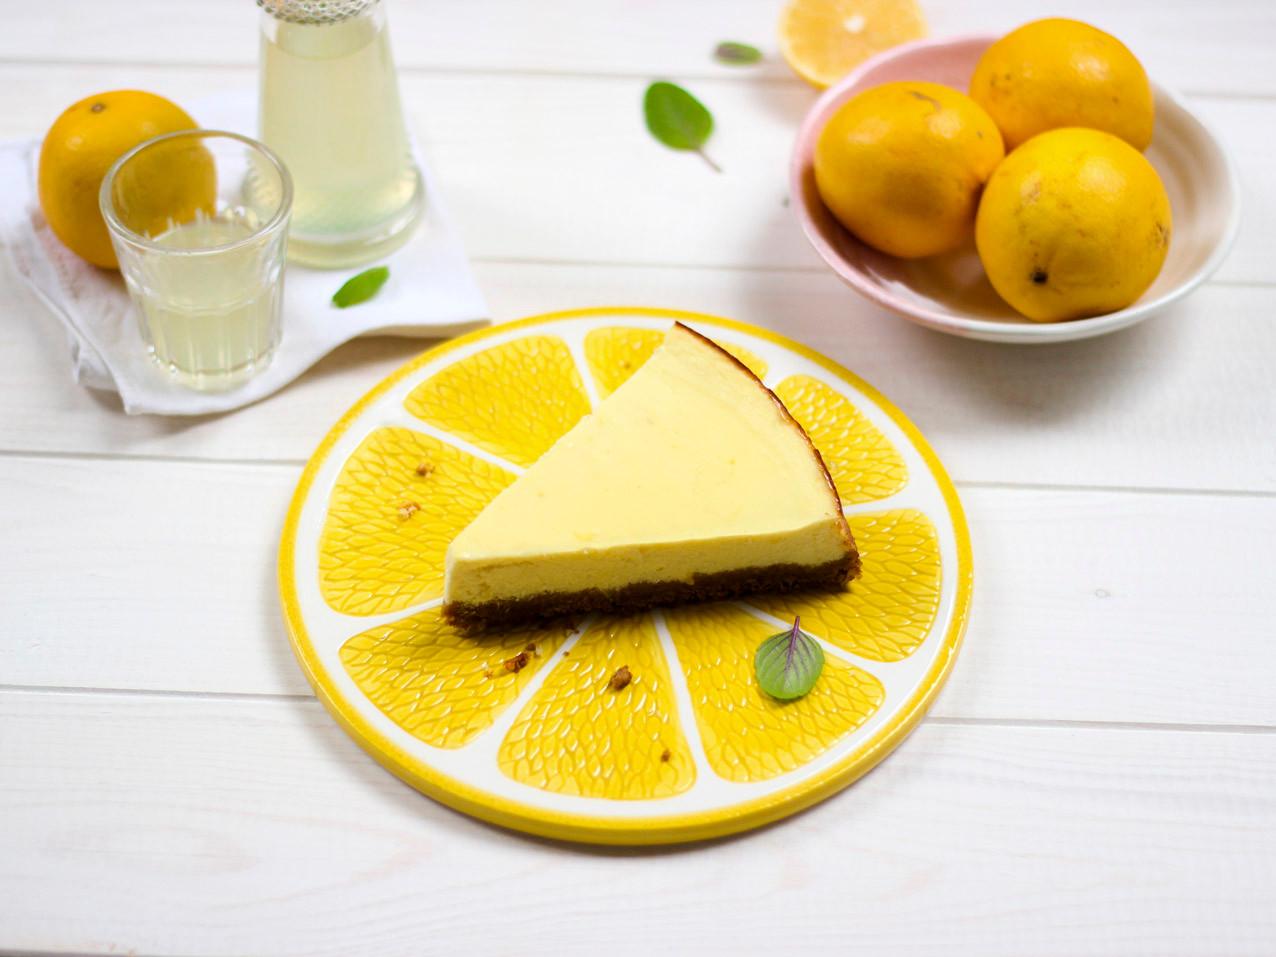 Ricotta-Cheesecake mit Zitrone & Limonce